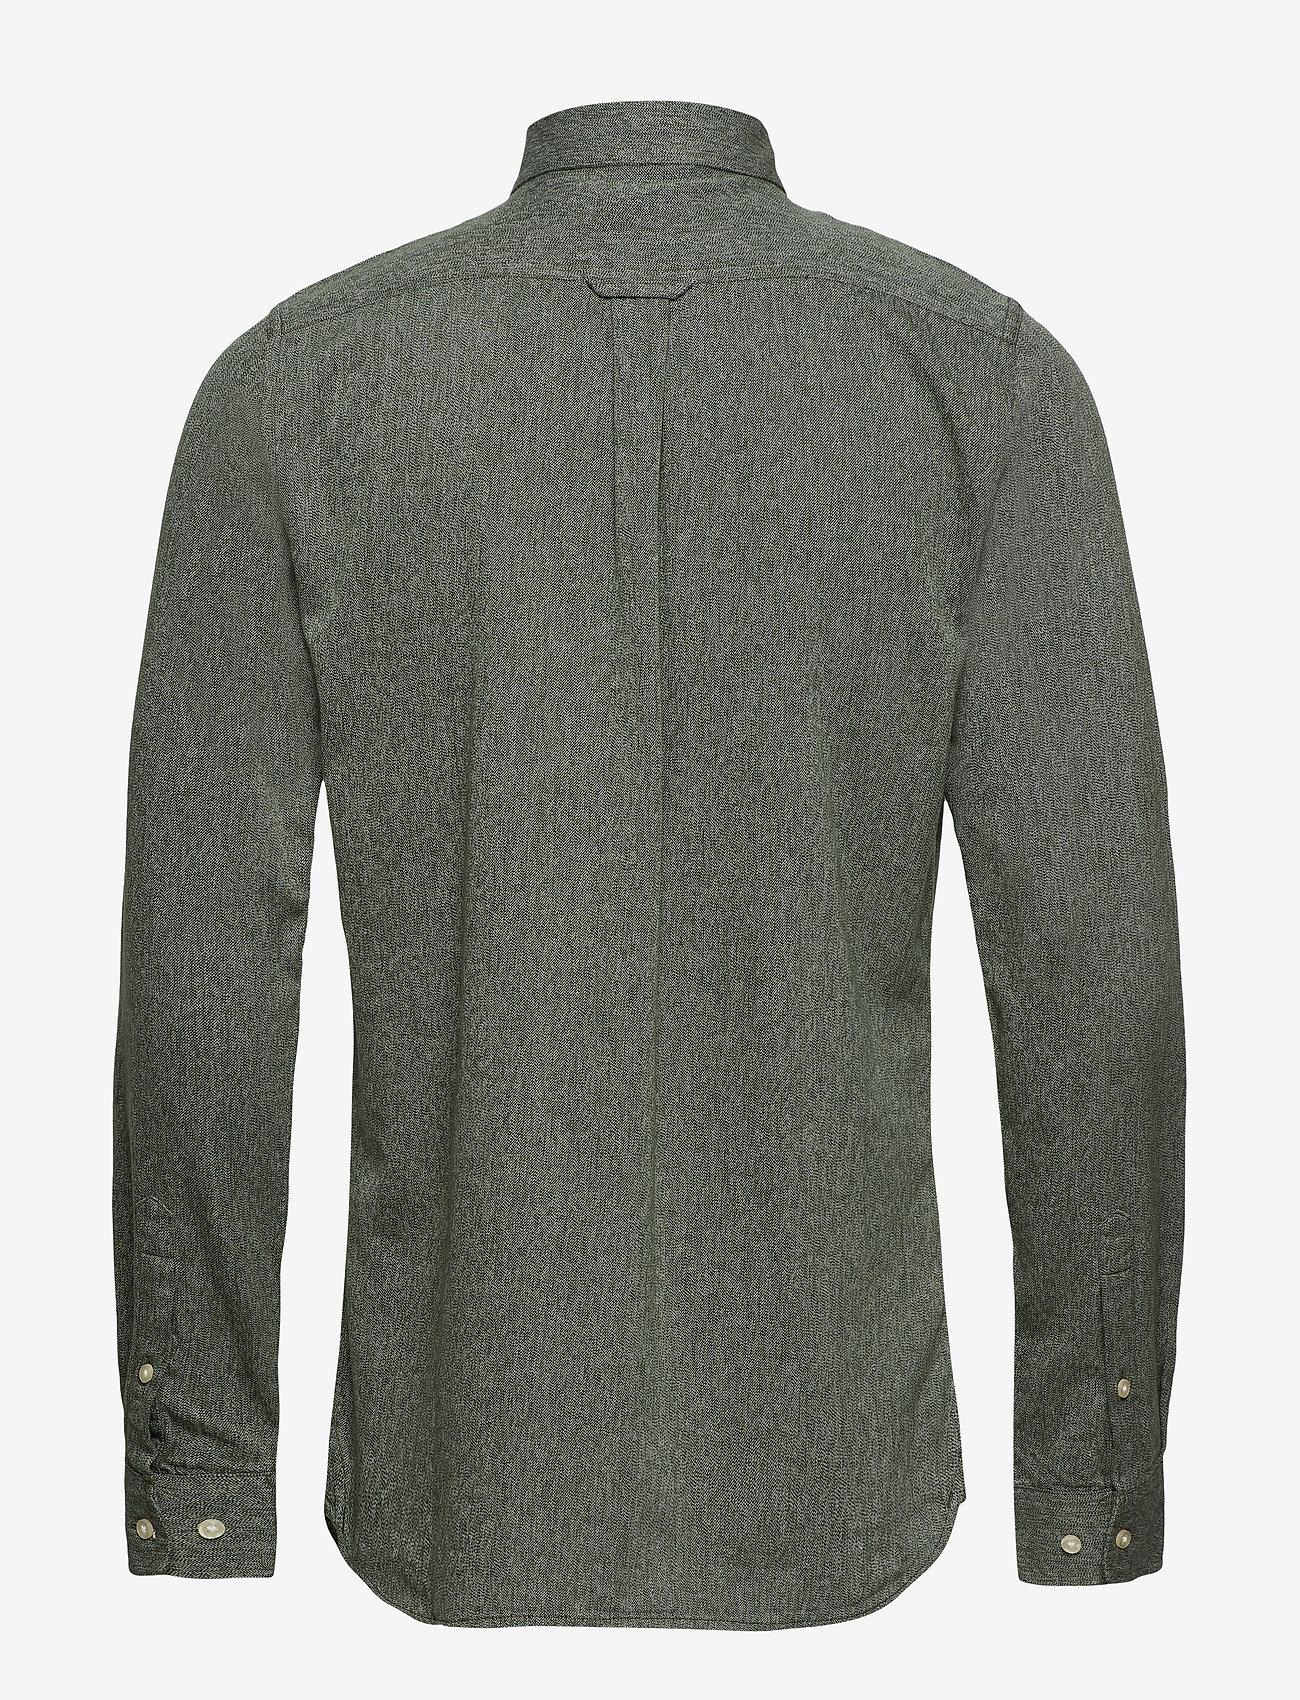 Melange Twill Shirt- Gots (Green Forest) (399.50 kr) - Knowledge Cotton Apparel I1i0GqLY